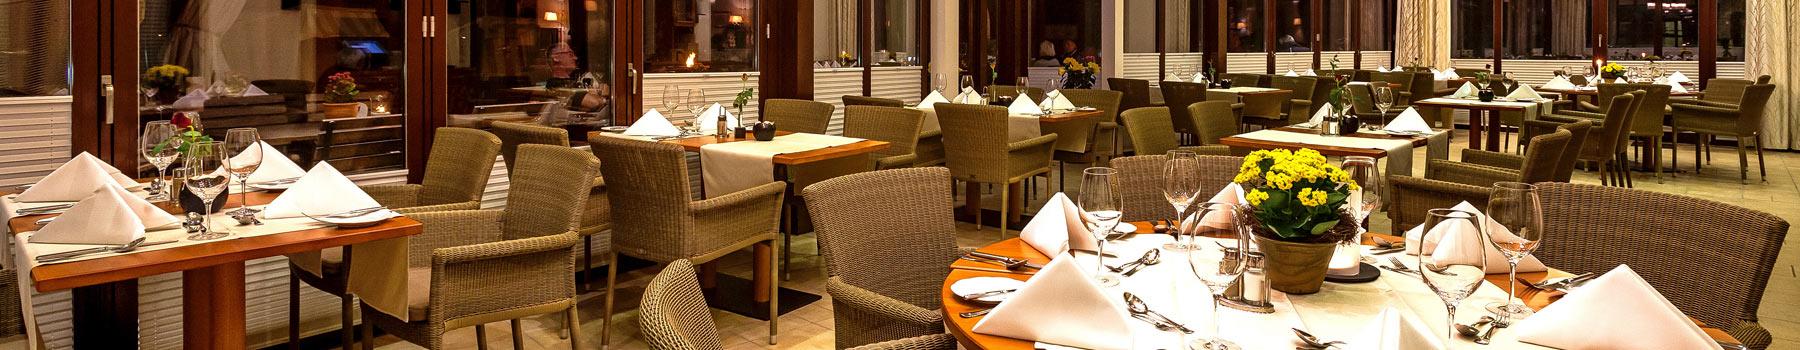 Restaurant schmal - Hotel Warnemünder Hof